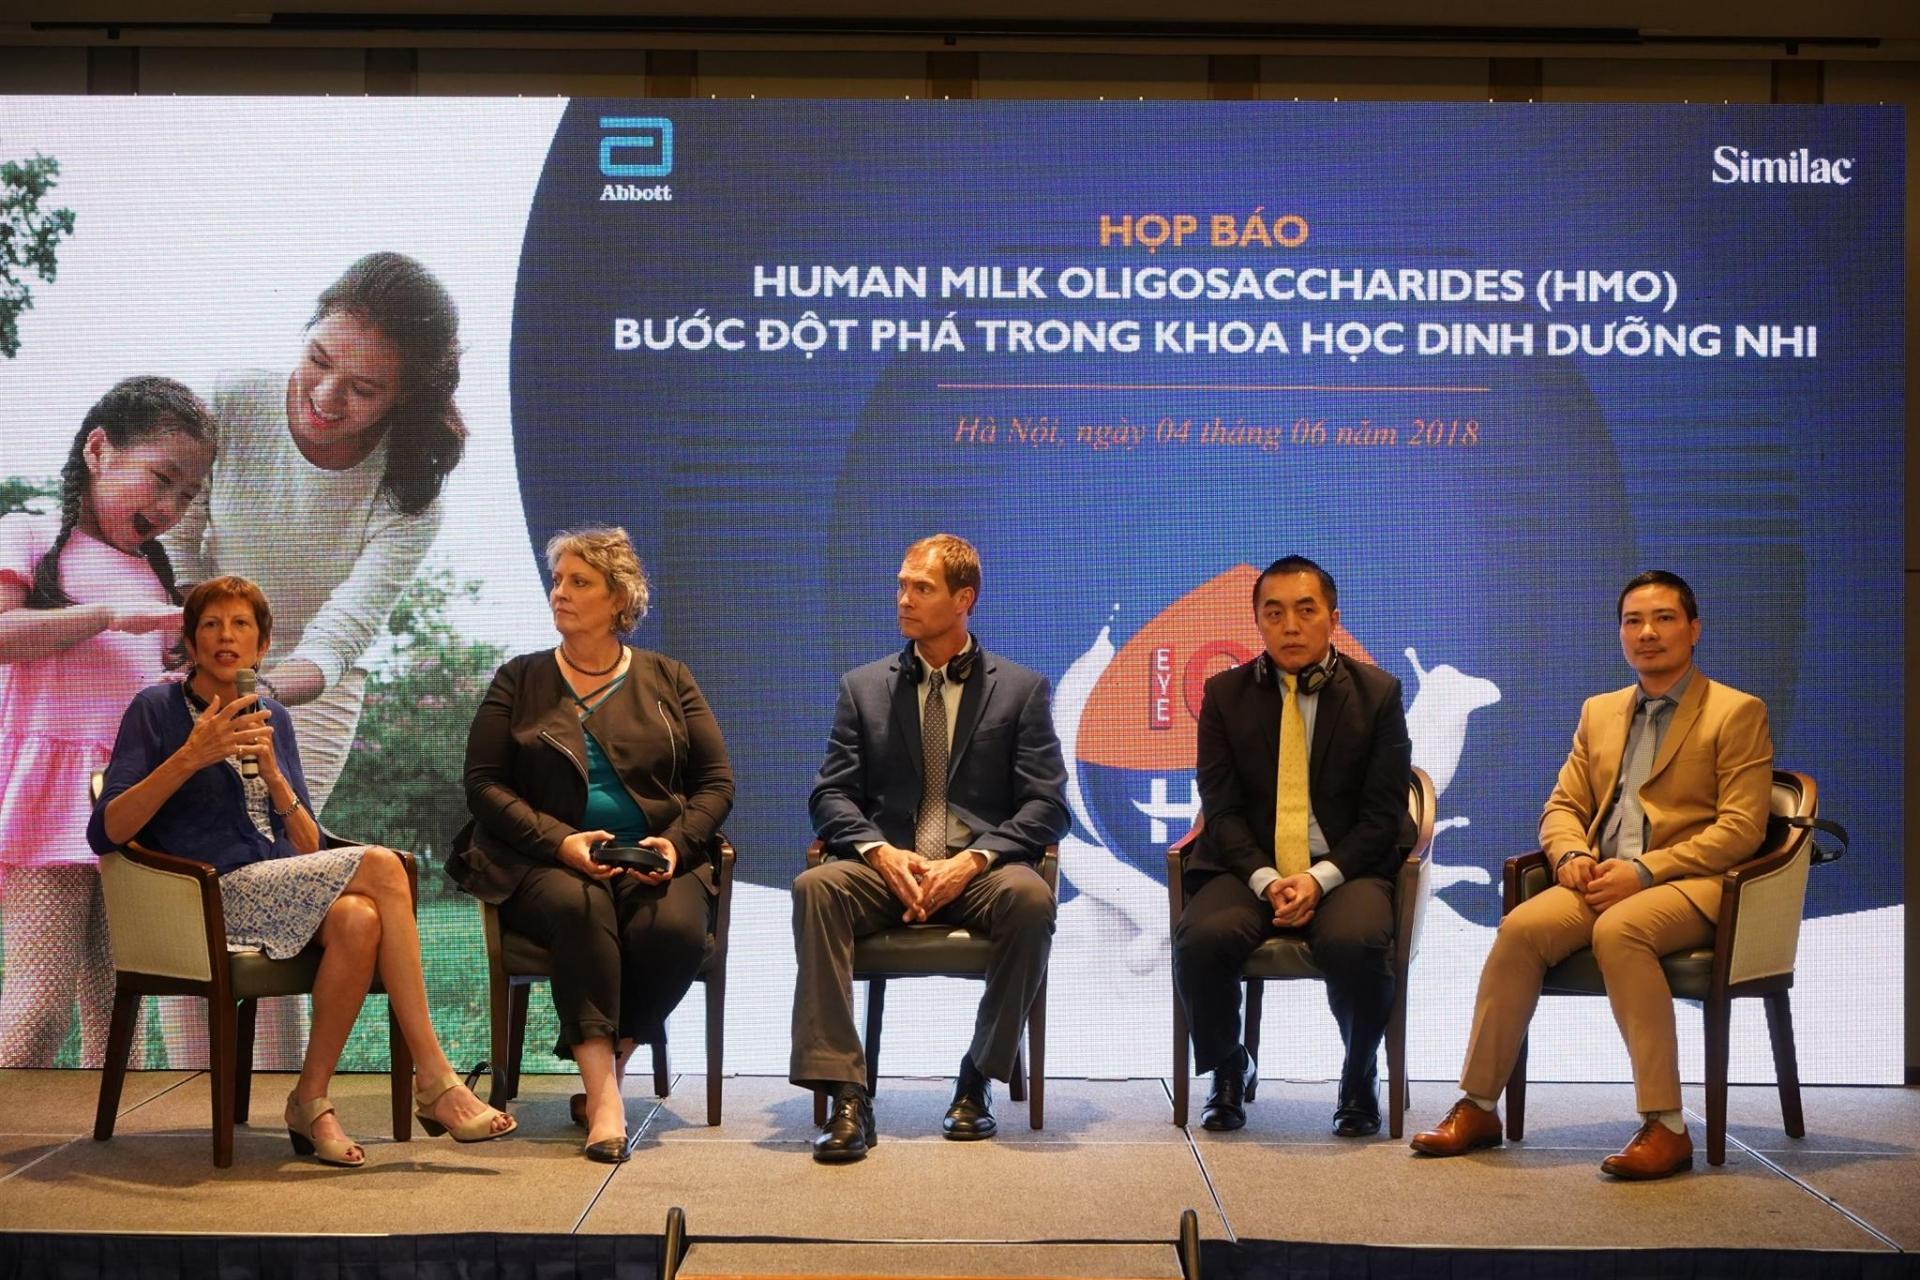 abbott launches first infant formula with immune nourishing human milk oligosaccharides